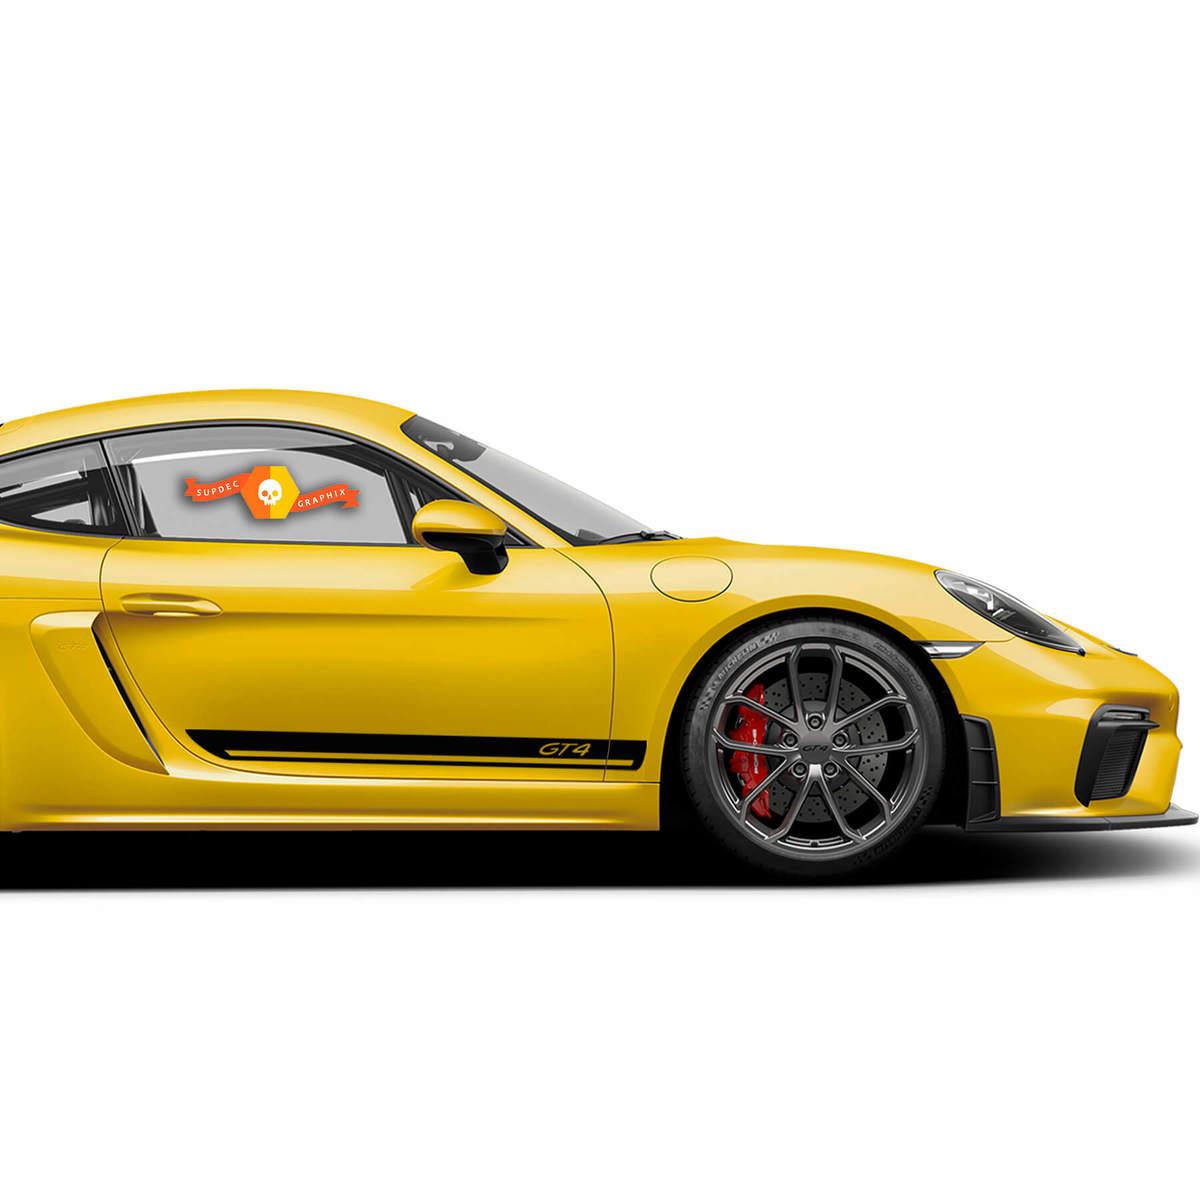 Porsche 718 Cayman GT4 Side Stripes Kit Decal Sticker